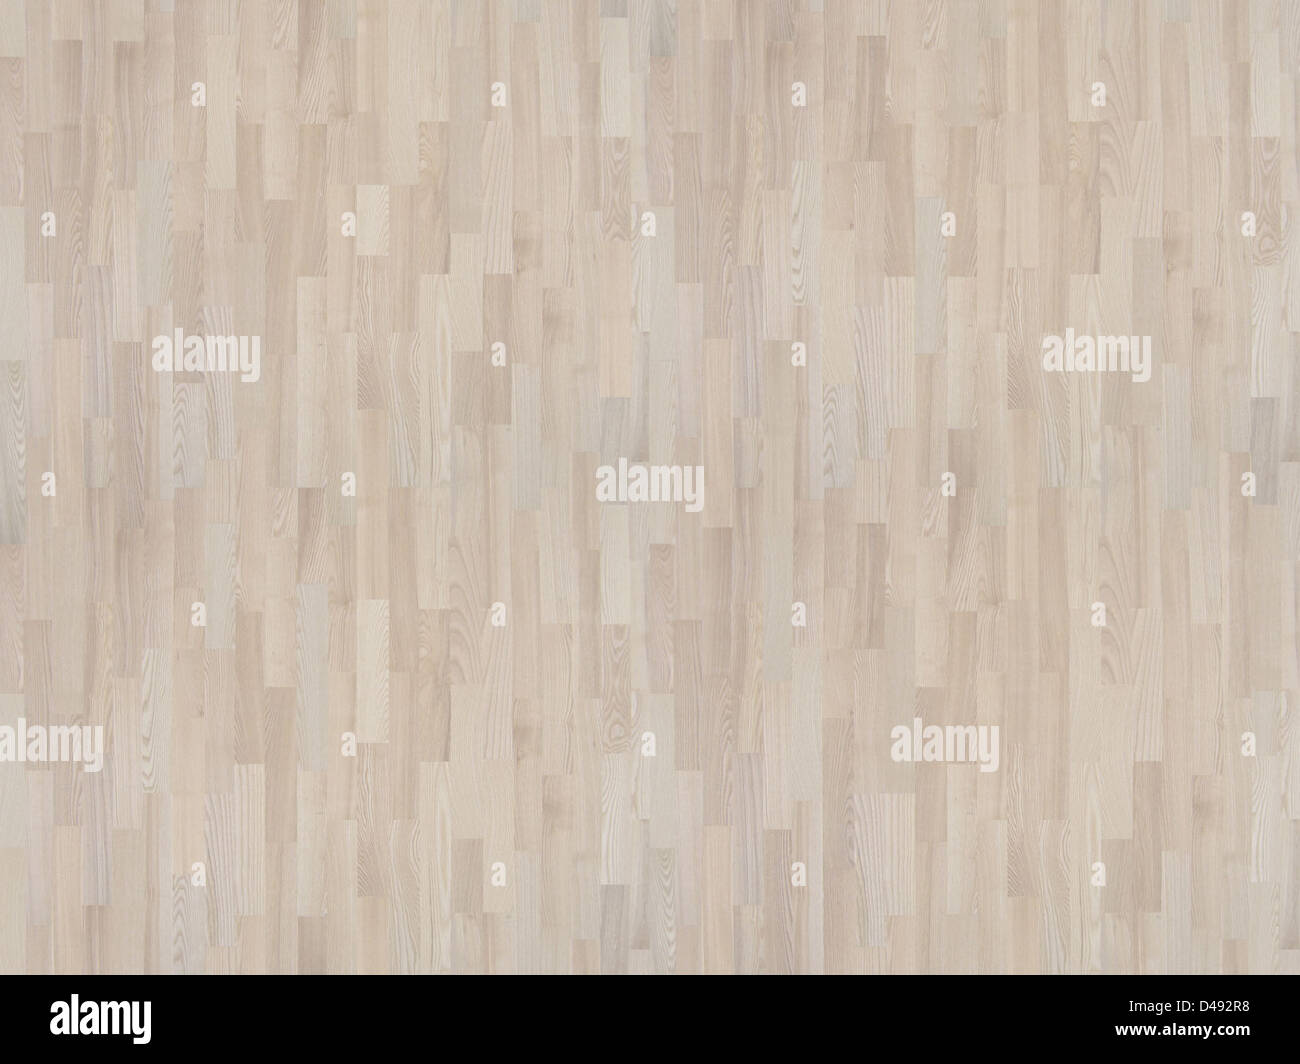 Seamless Texture White Ash Wood Floor Stock Photo 54289516